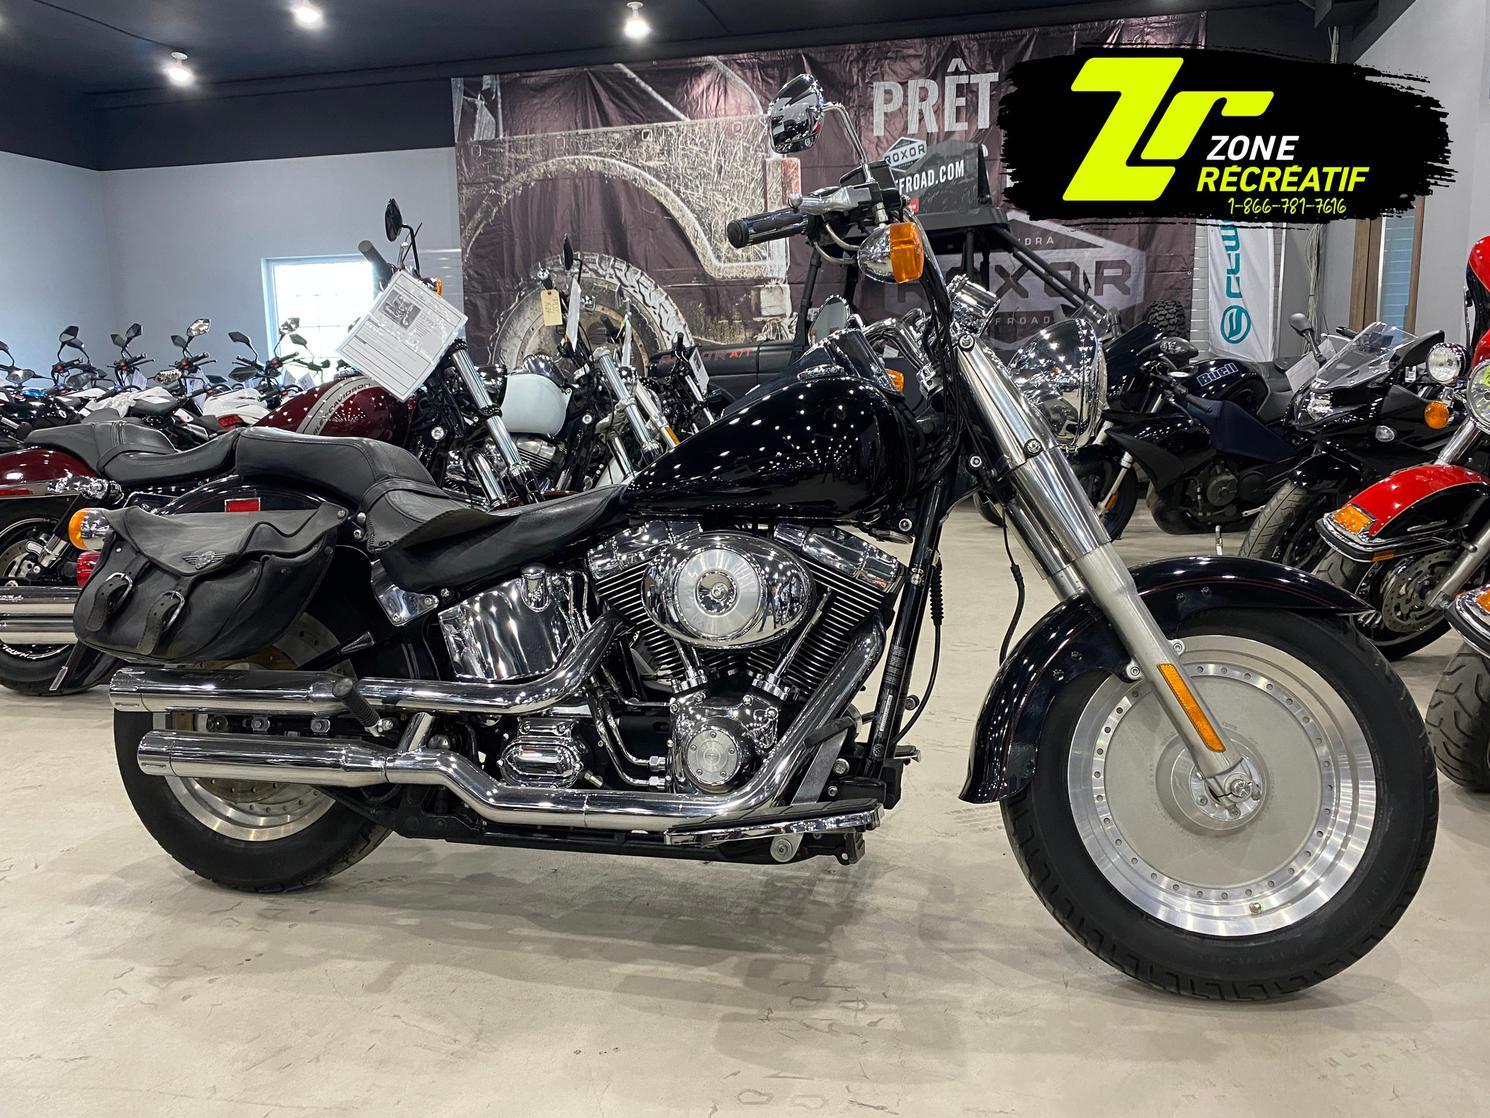 2000 Harley-Davidson FLSTF FATBOY